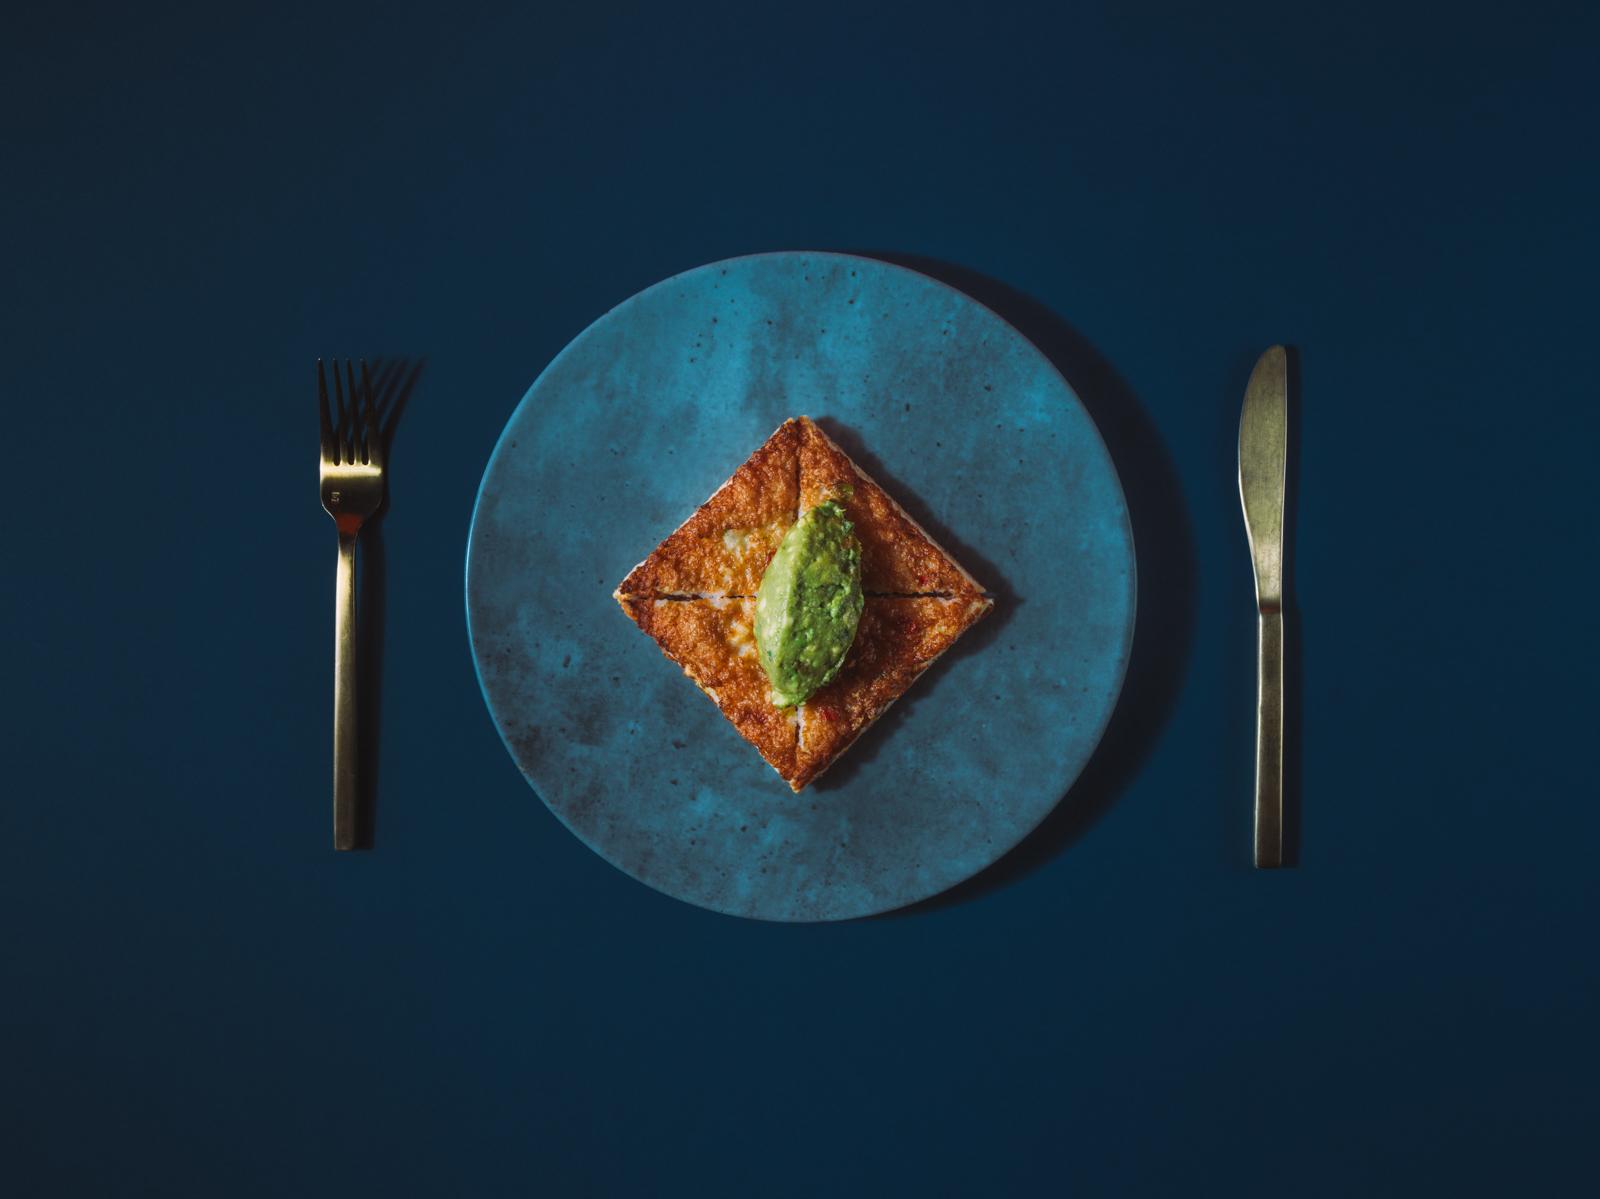 Rice-and-Gold-Food-All-Good-NYC-Nick-Johnson-Photography-10.JPG